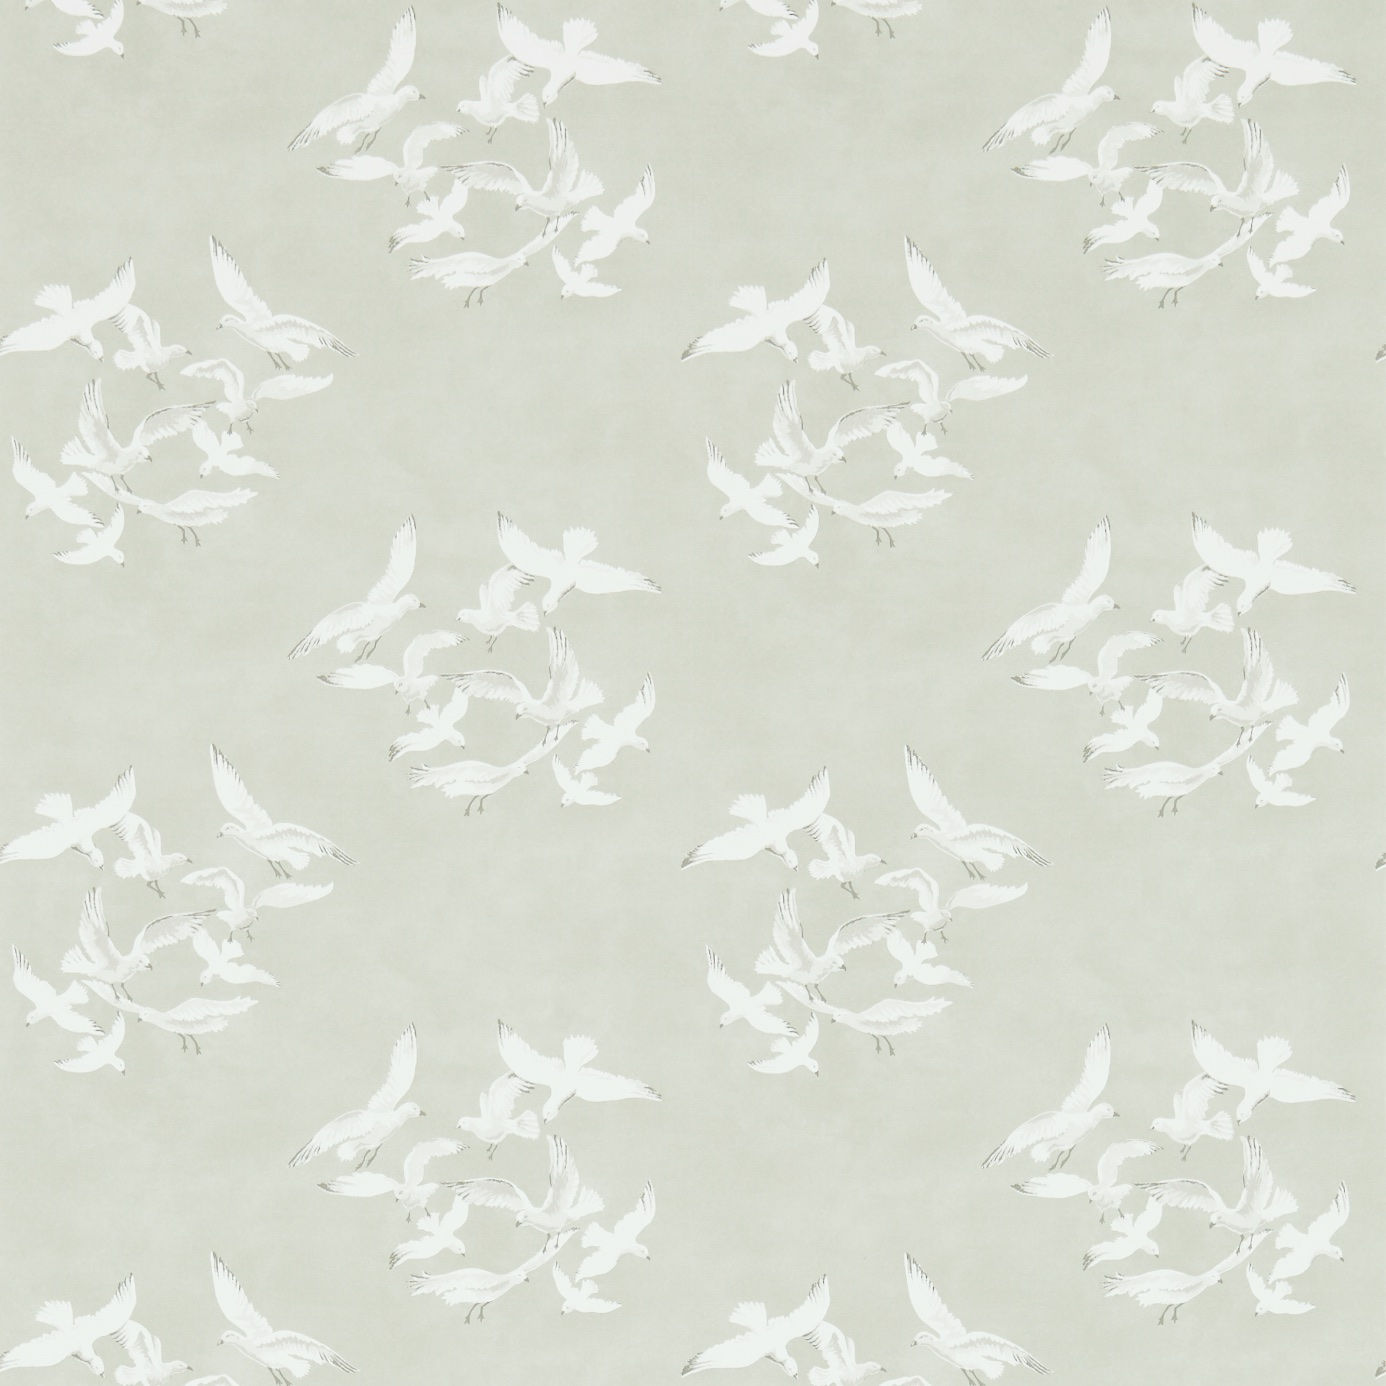 Seagulls-214587